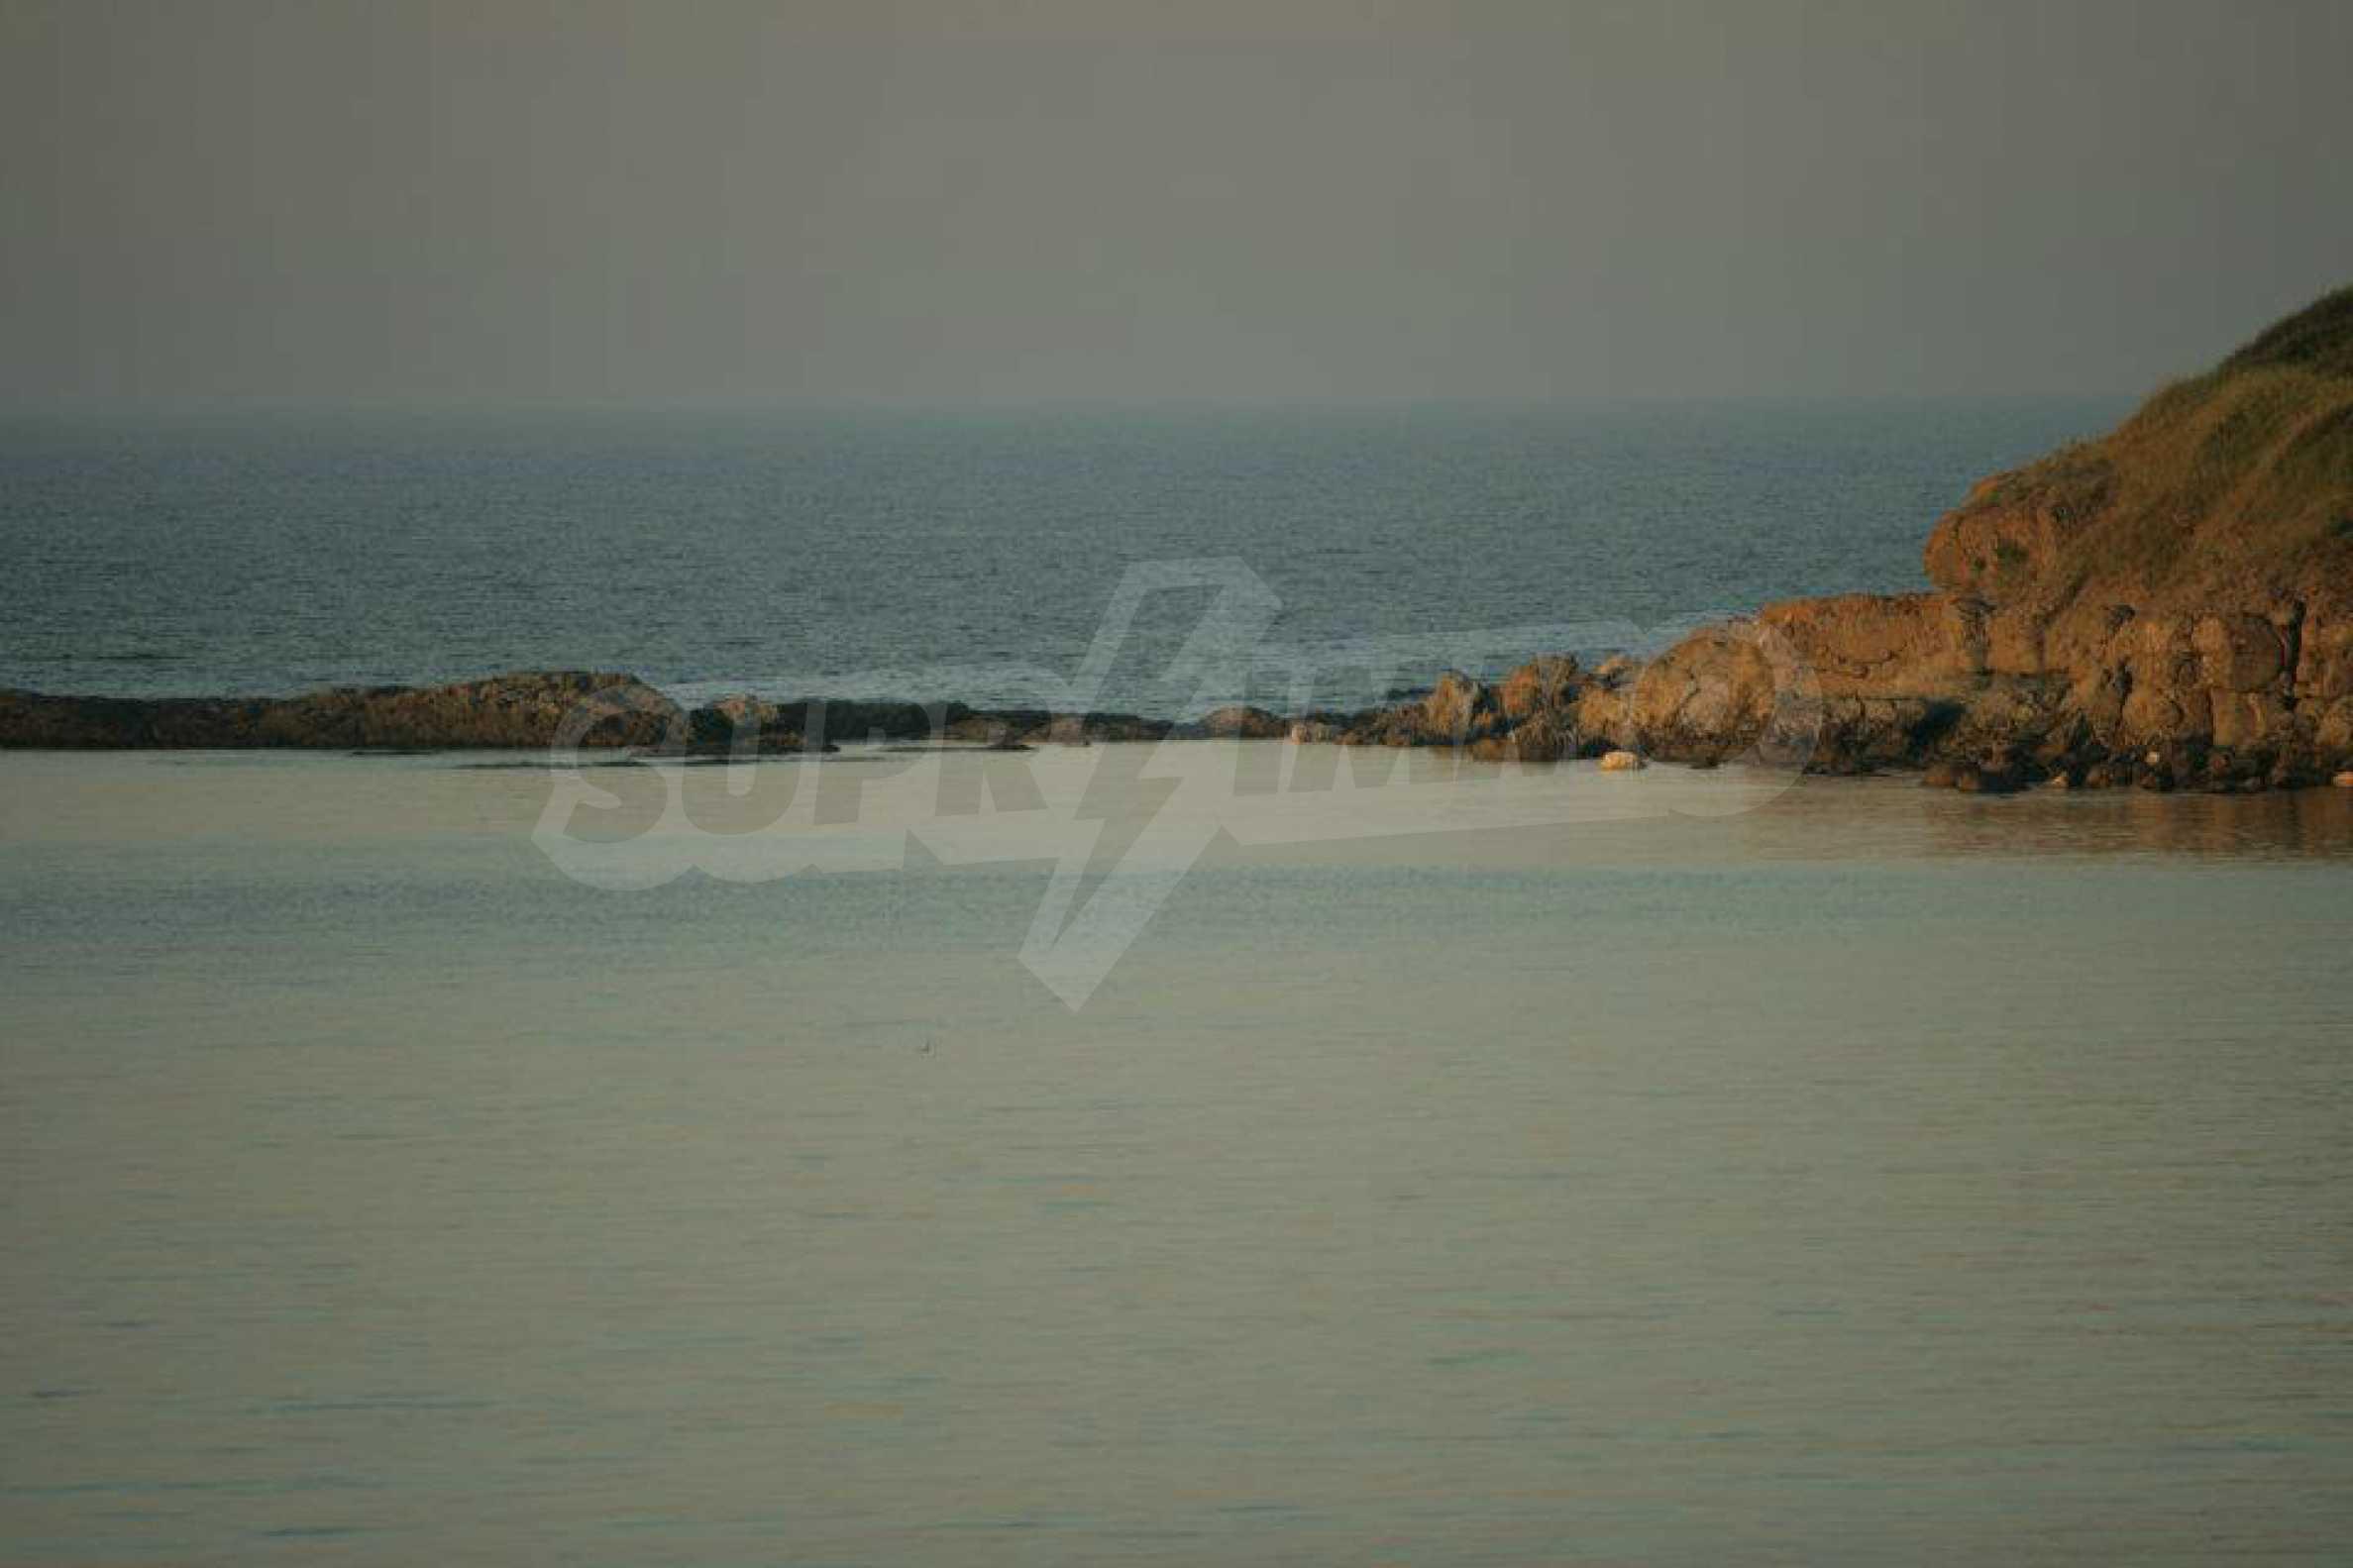 Примеа Бийч Резиденс / Primea Beach Residence 66